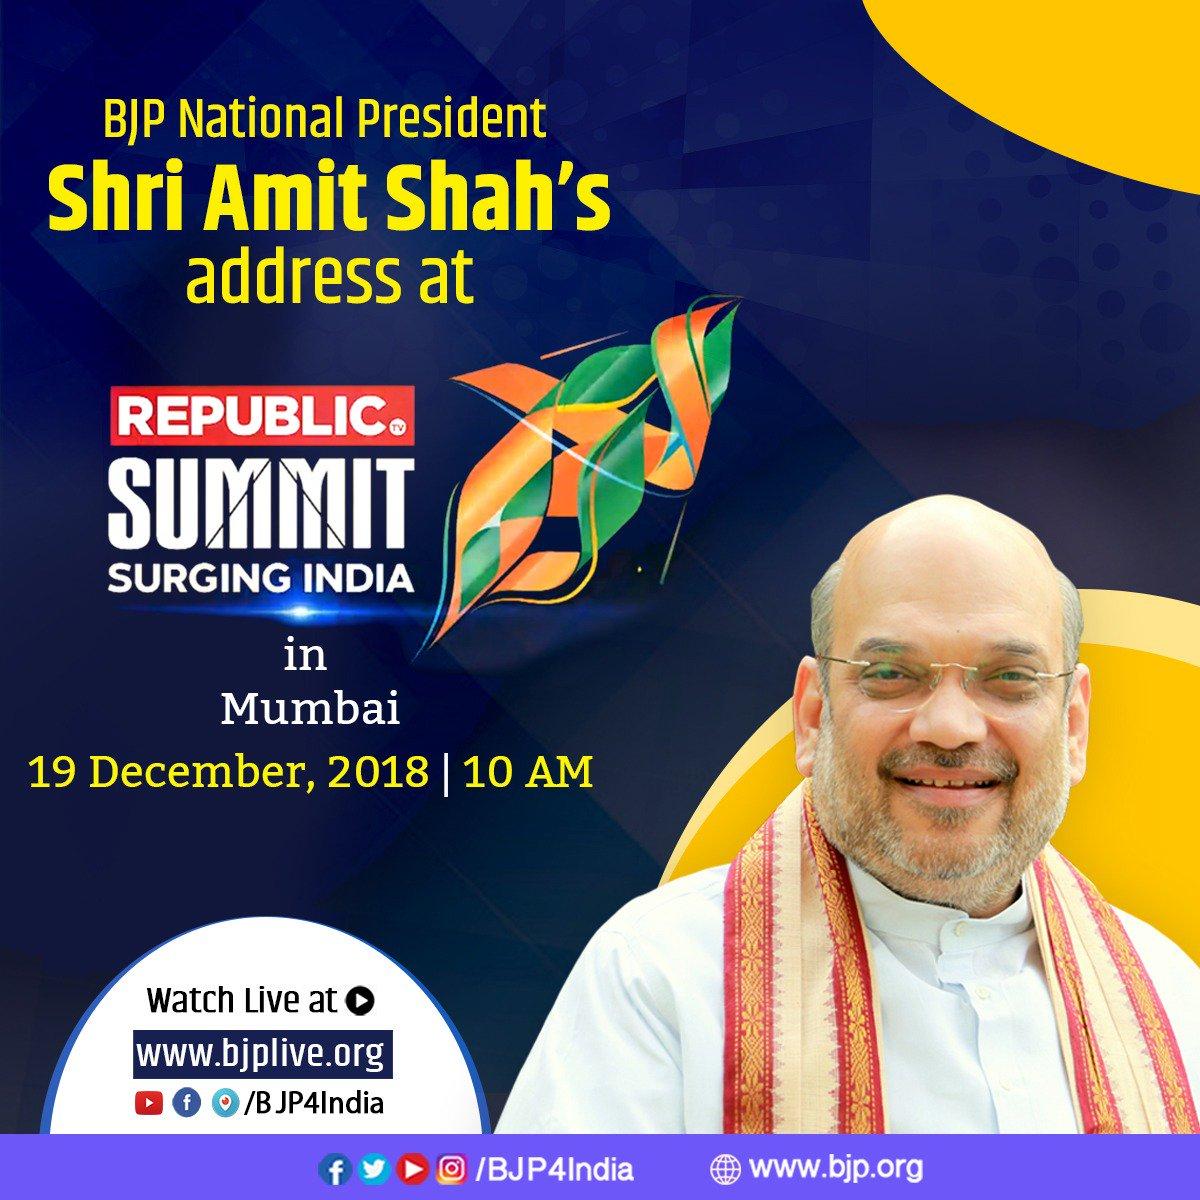 BJP National President Shri @AmitShahs address at Republic Summit- Surging India tomorrow 19 December at 10am. @republic #ShahAtRepublicSummit Watch live at twitter.com/amitshah Fb.com/amitshah.offic…